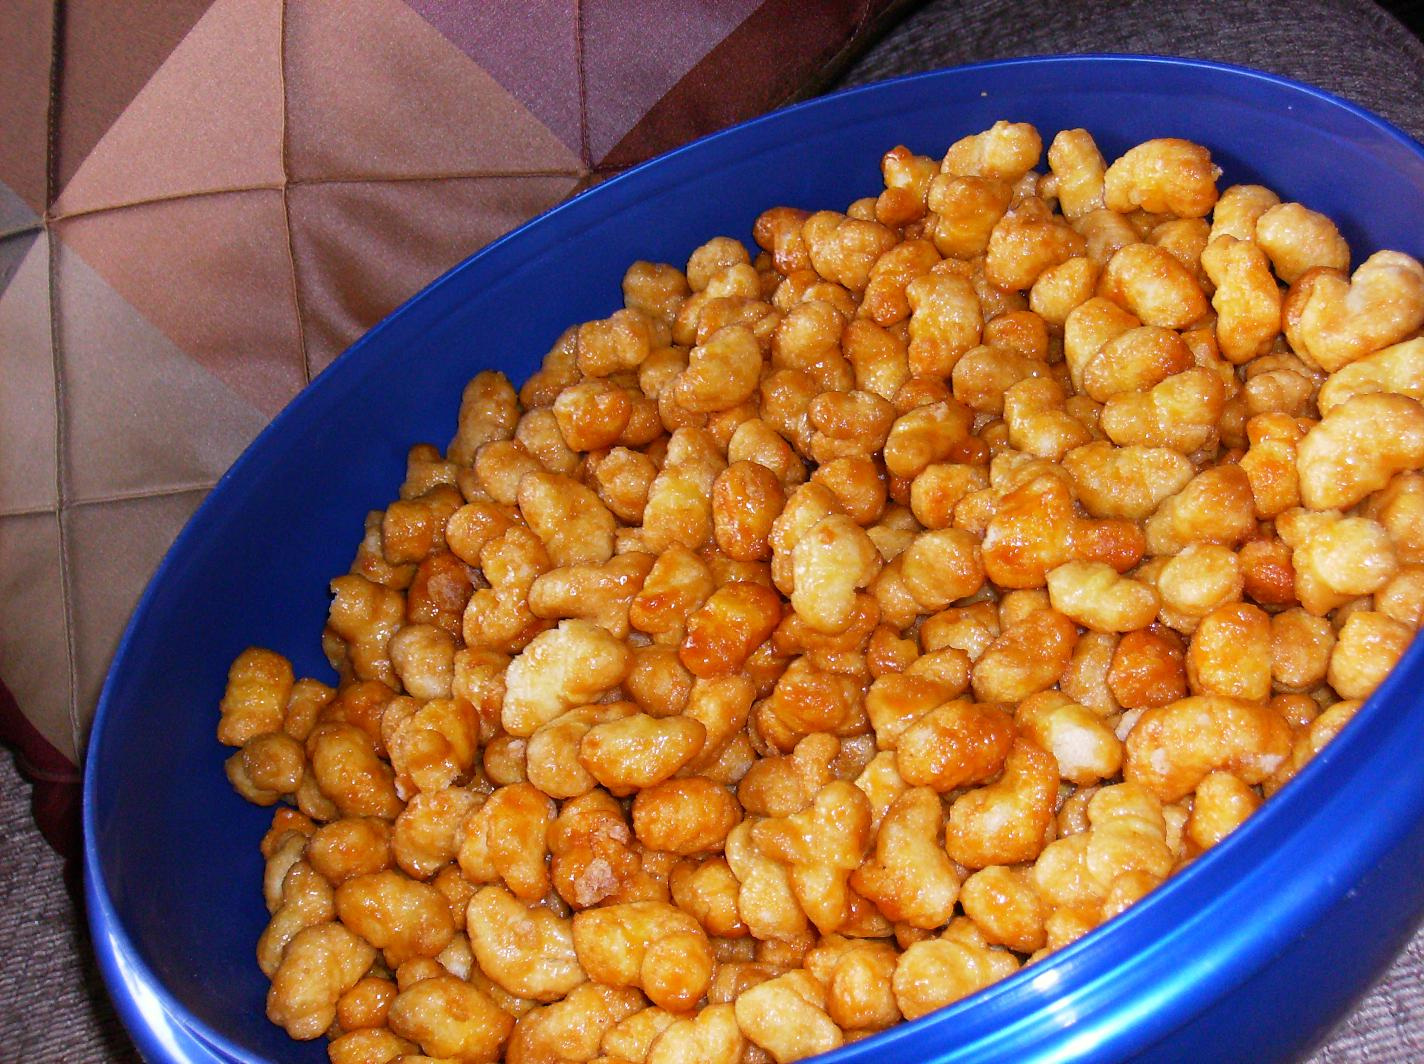 Puffcorn Caramel Corn Tasty Kitchen A Happy Recipe Community